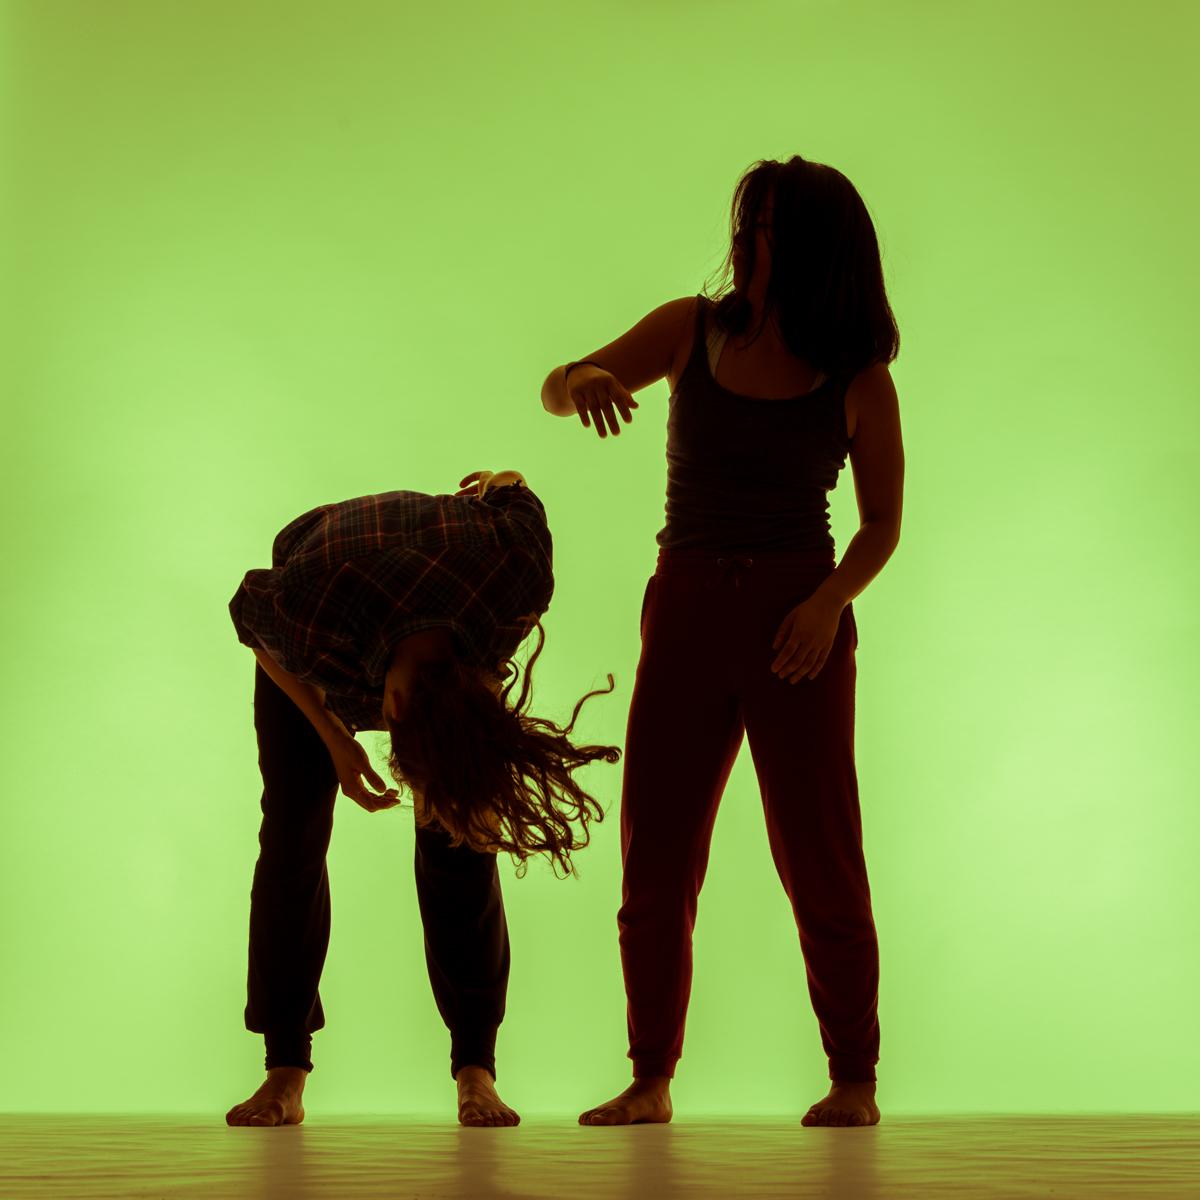 stephen-rusk-alexandra-pholien-leanne-vincent-contemporary-dance-18-09-52.jpg